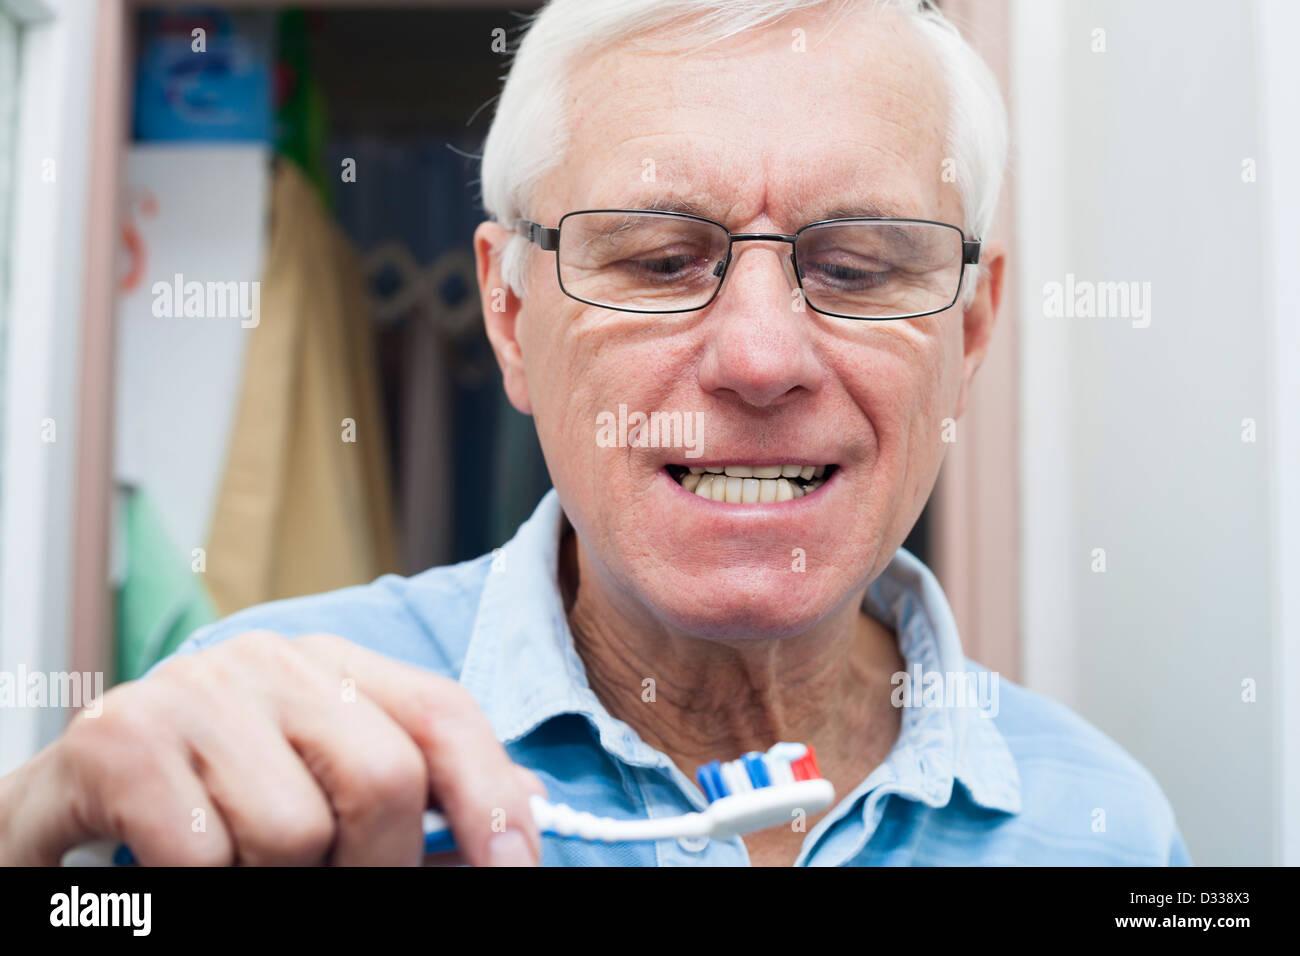 Close up of senior man going to brush his teeth. - Stock Image